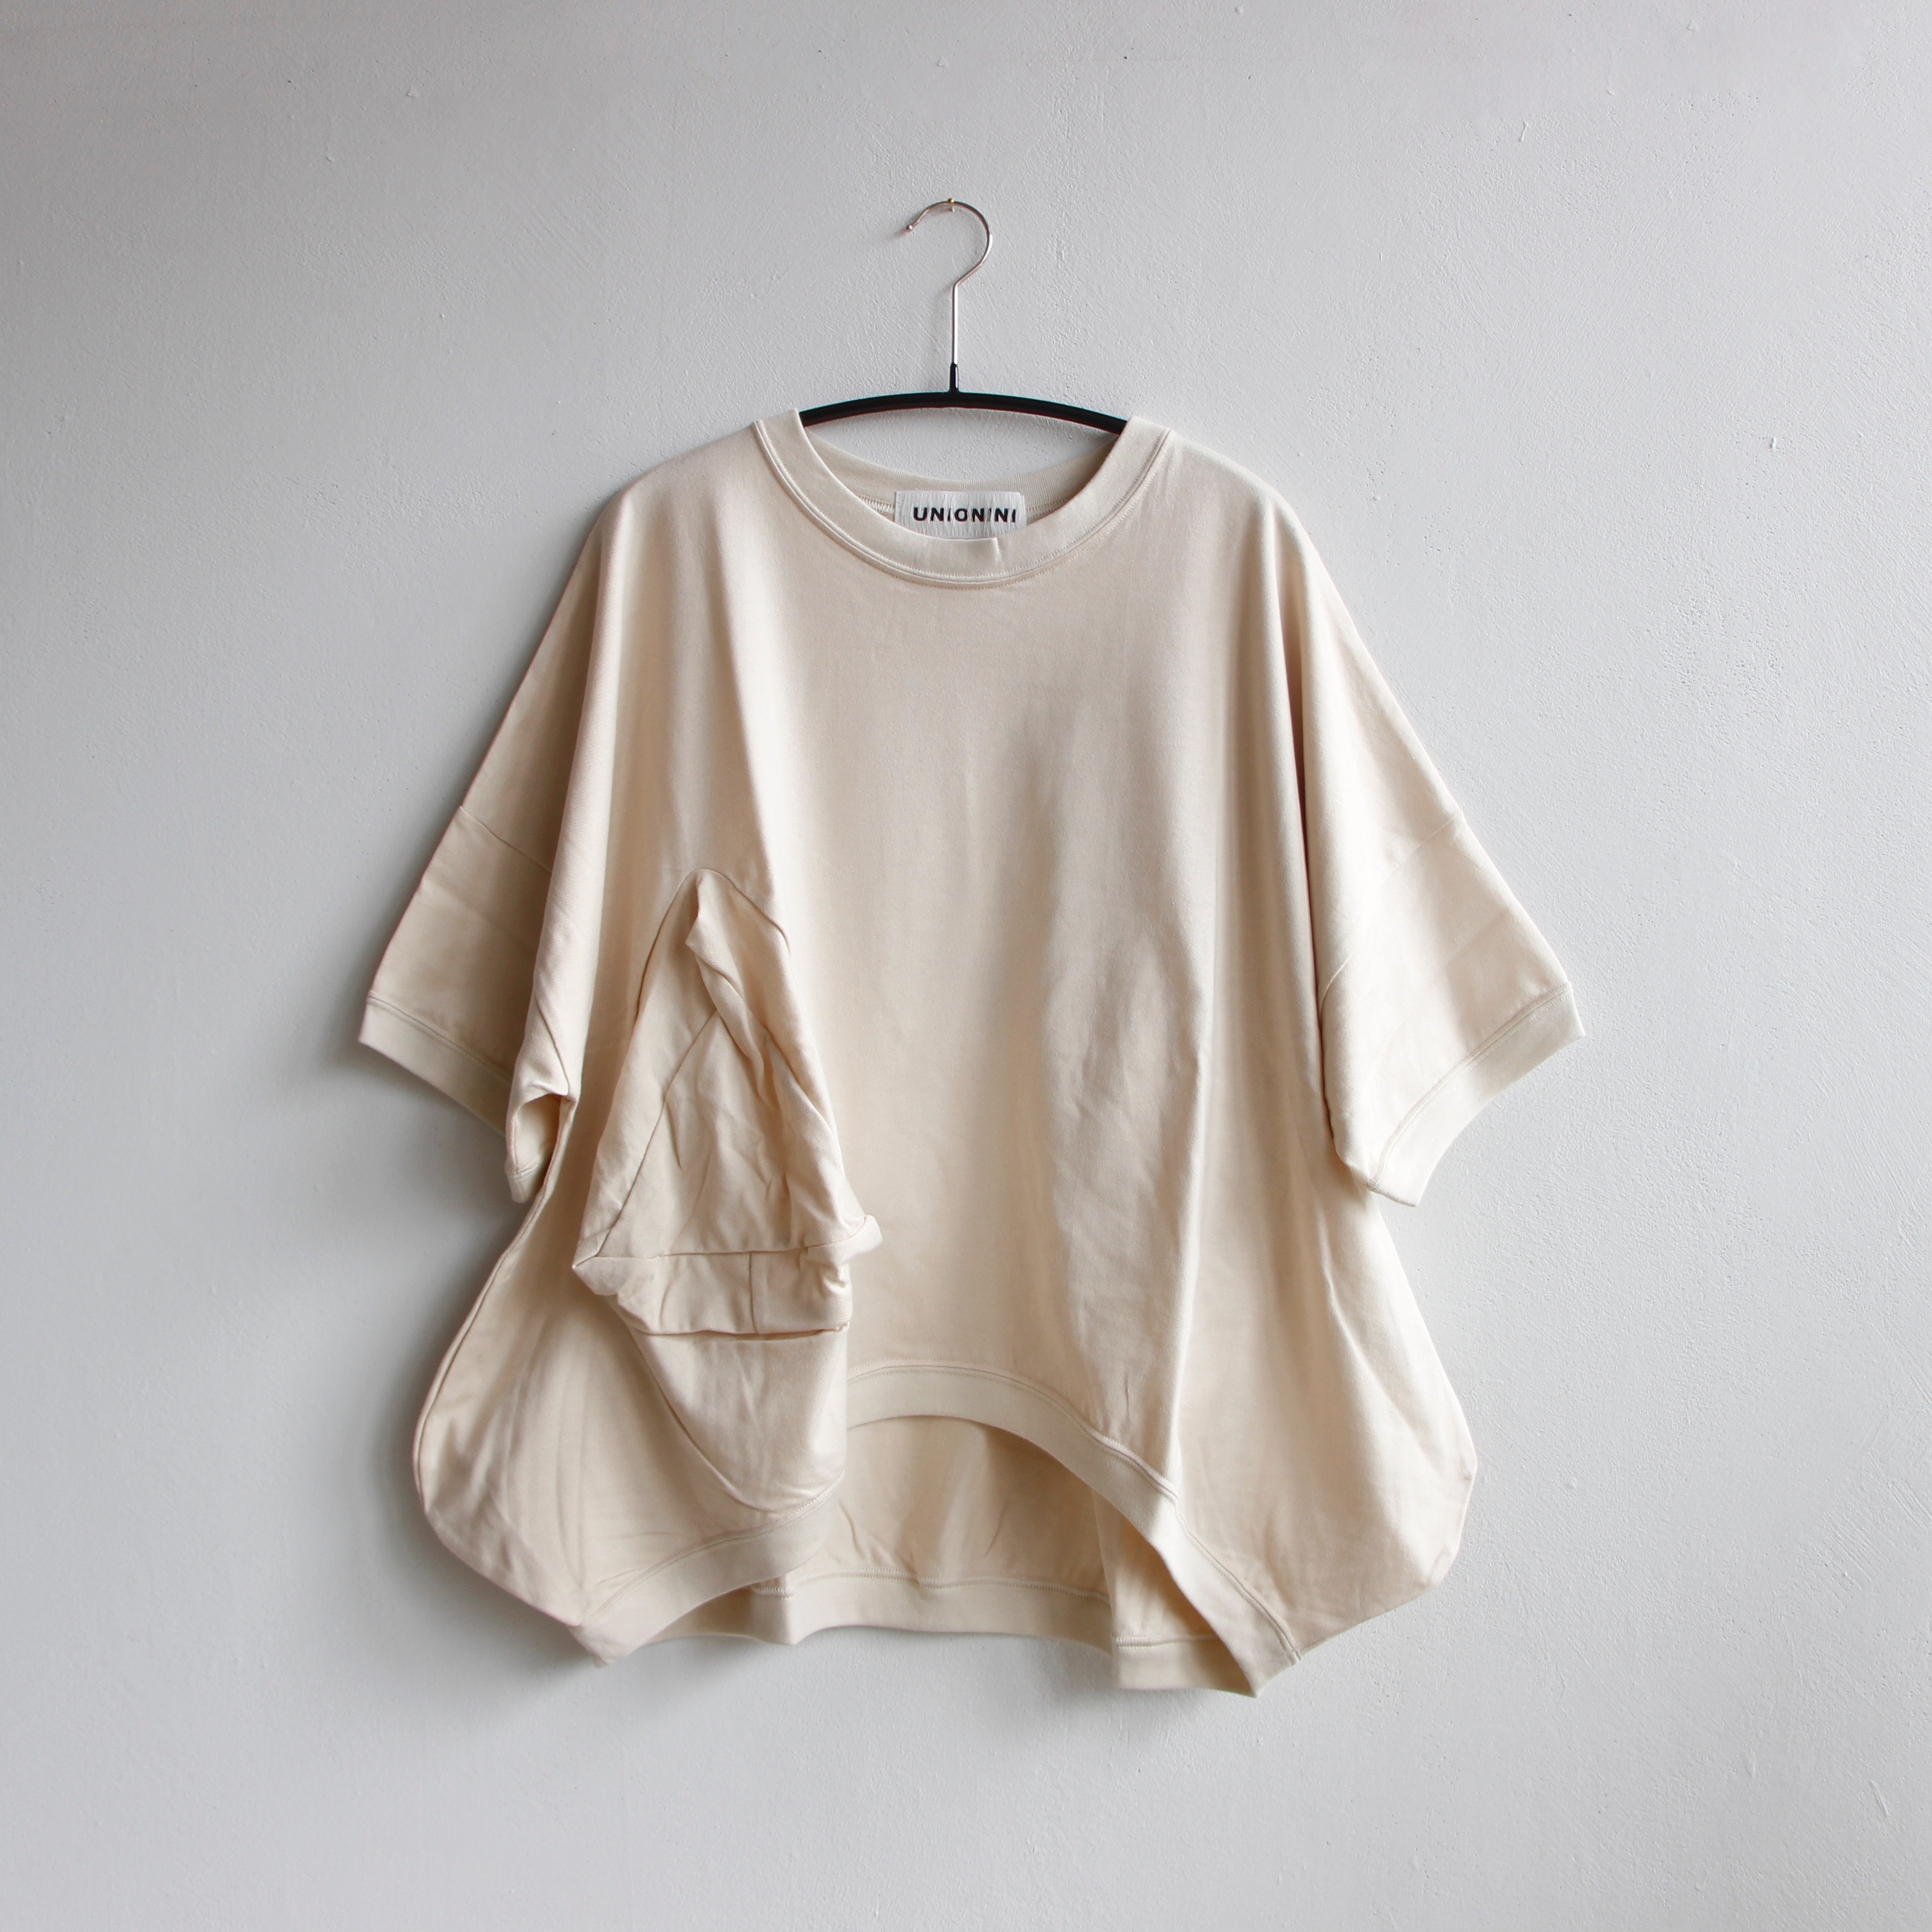 《UNIONINI 2020SS》◯△ T-shirt / ecru / 12-14Y・M(大人)